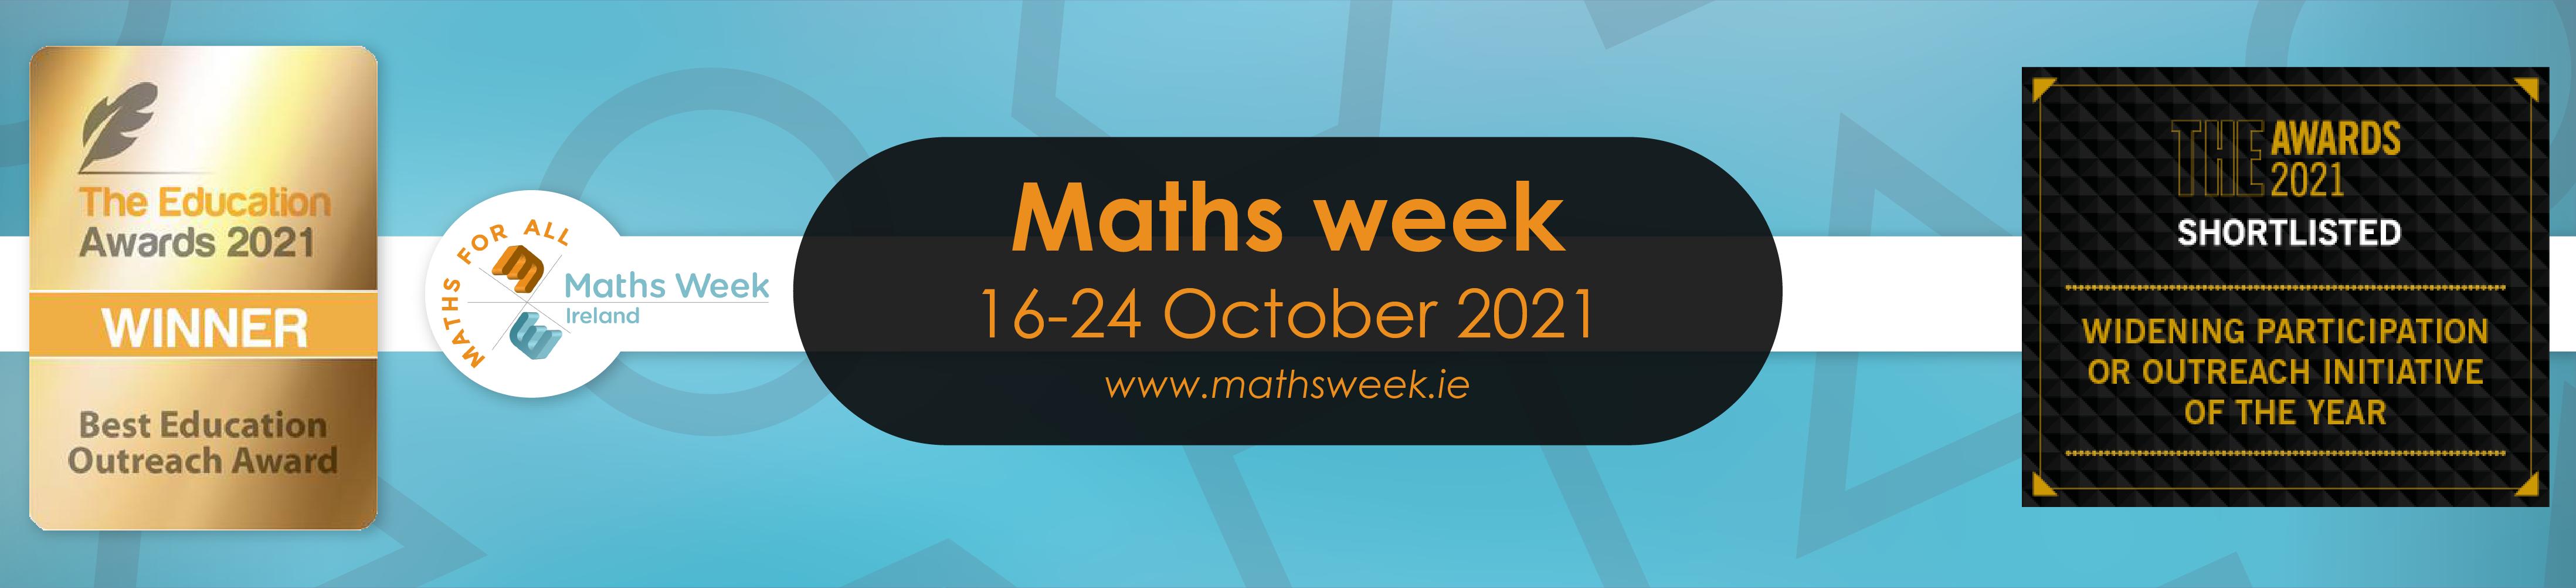 Maths week banner with awards September 2021